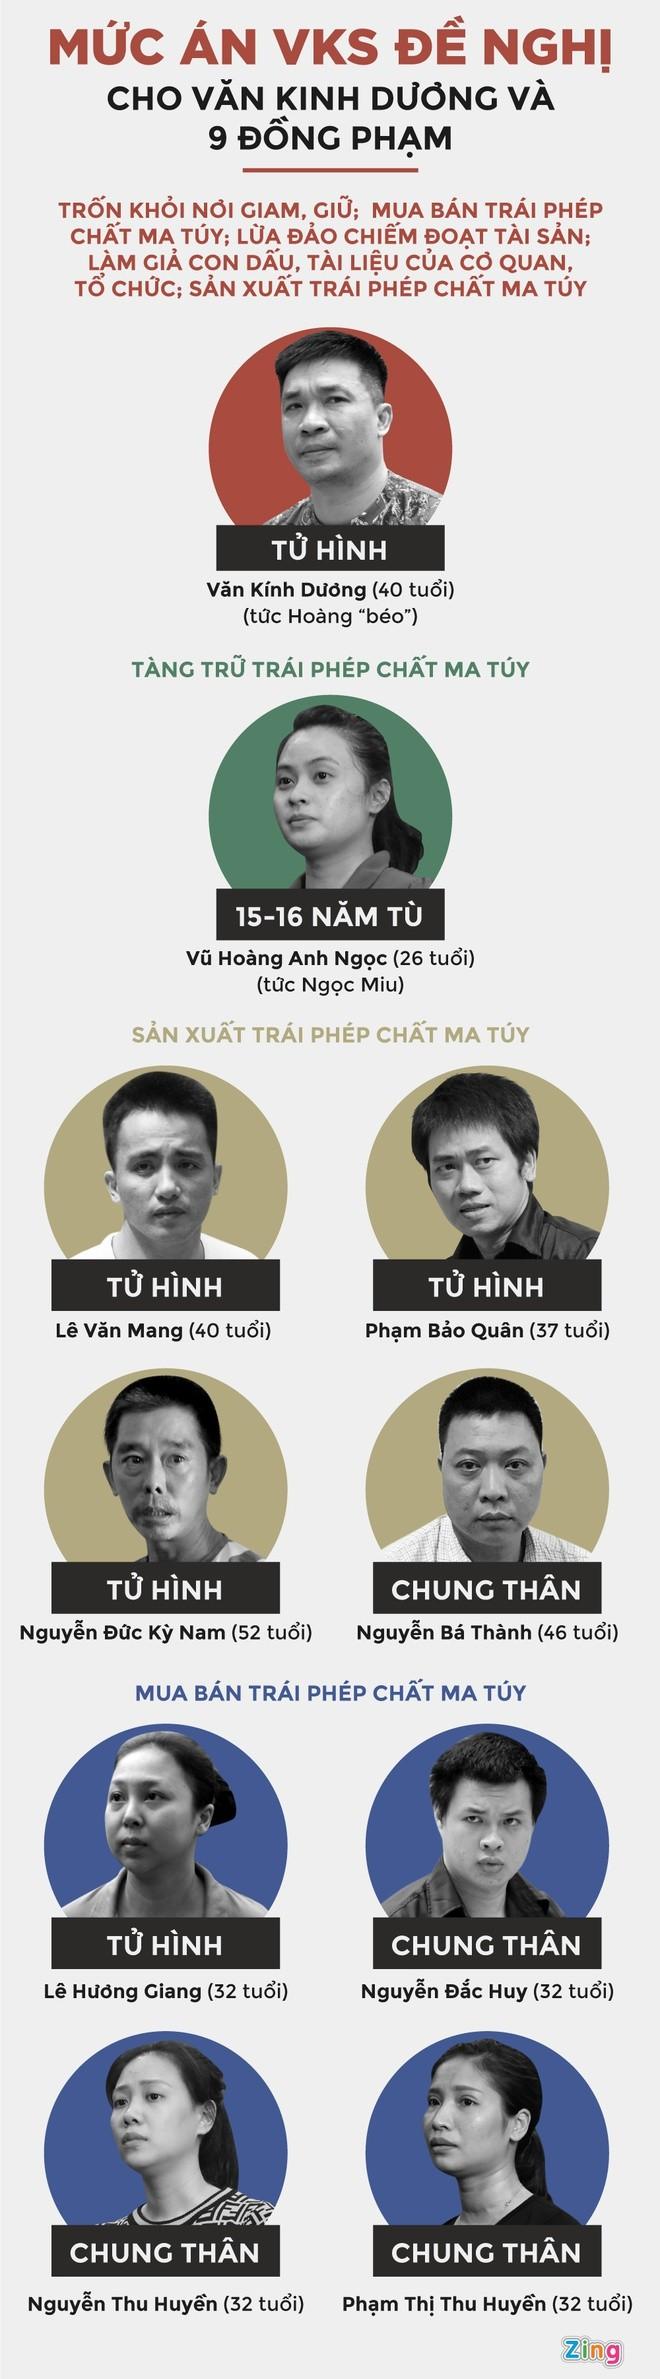 De nghi tra ho so vu Van Kinh Duong de lam ro nguoi cam dau-Hinh-3